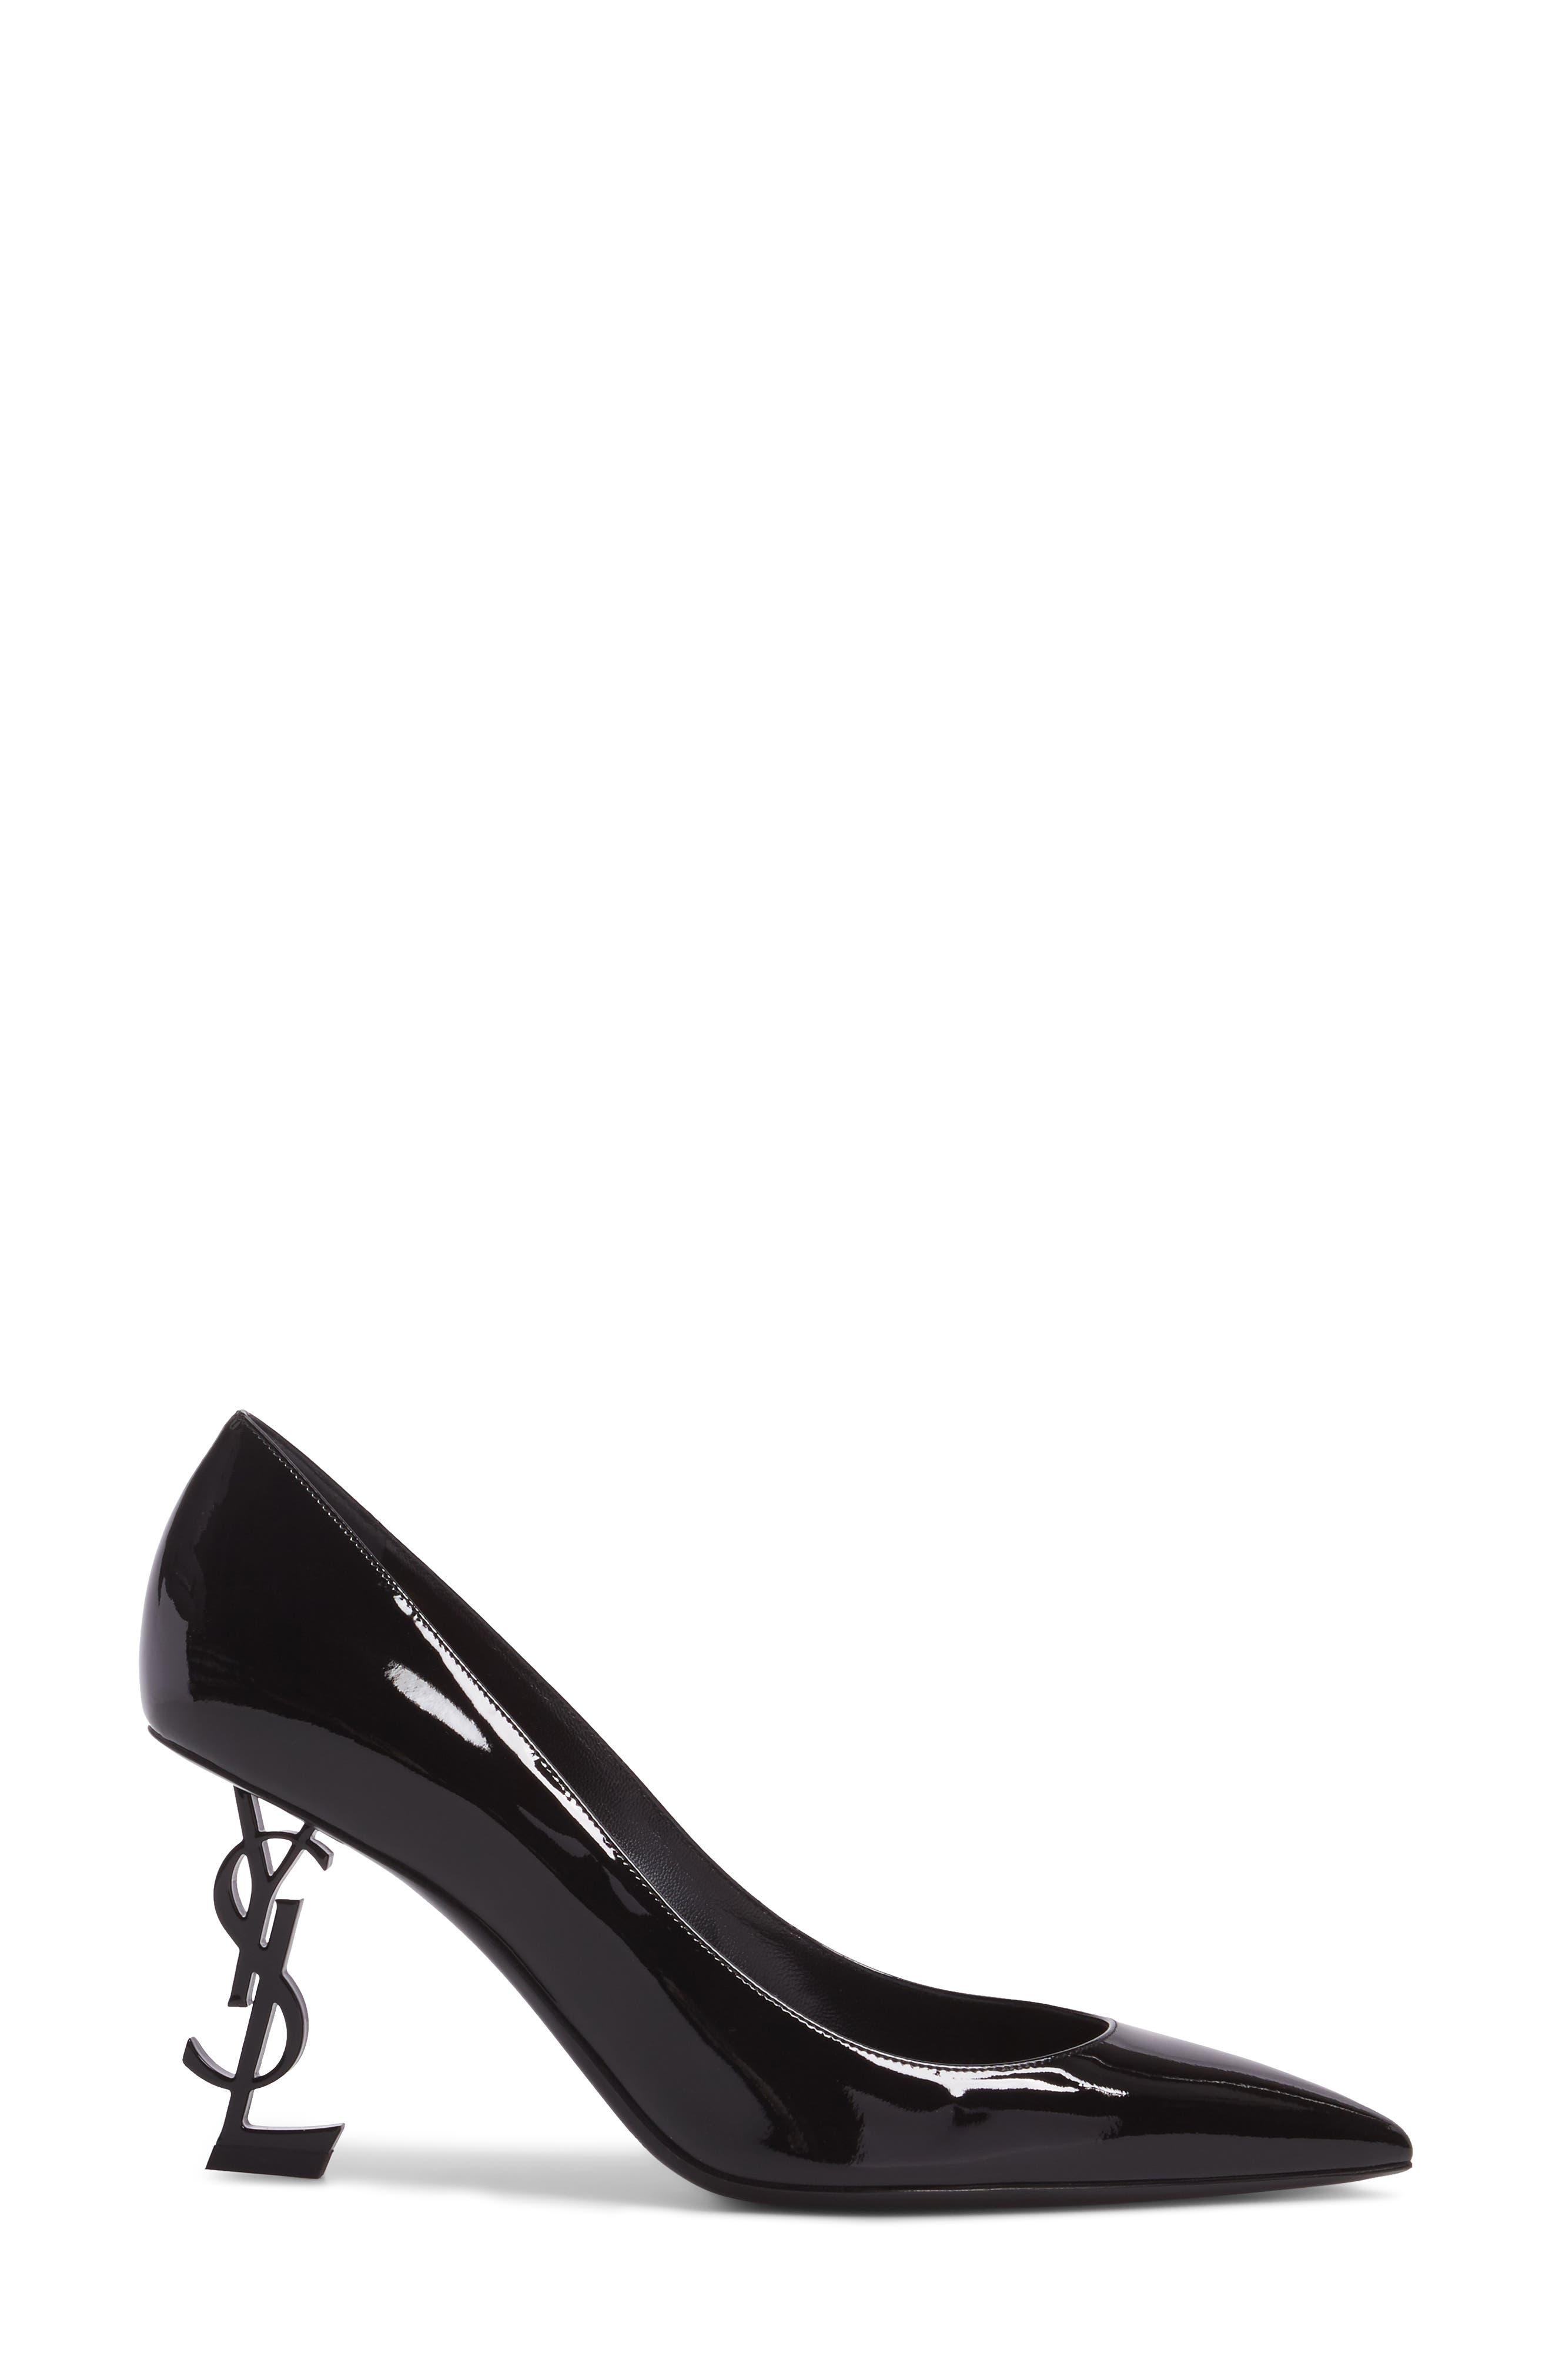 Alternate Image 3  - Saint Laurent Opyum YSL Pointy Toe Pump (Women)